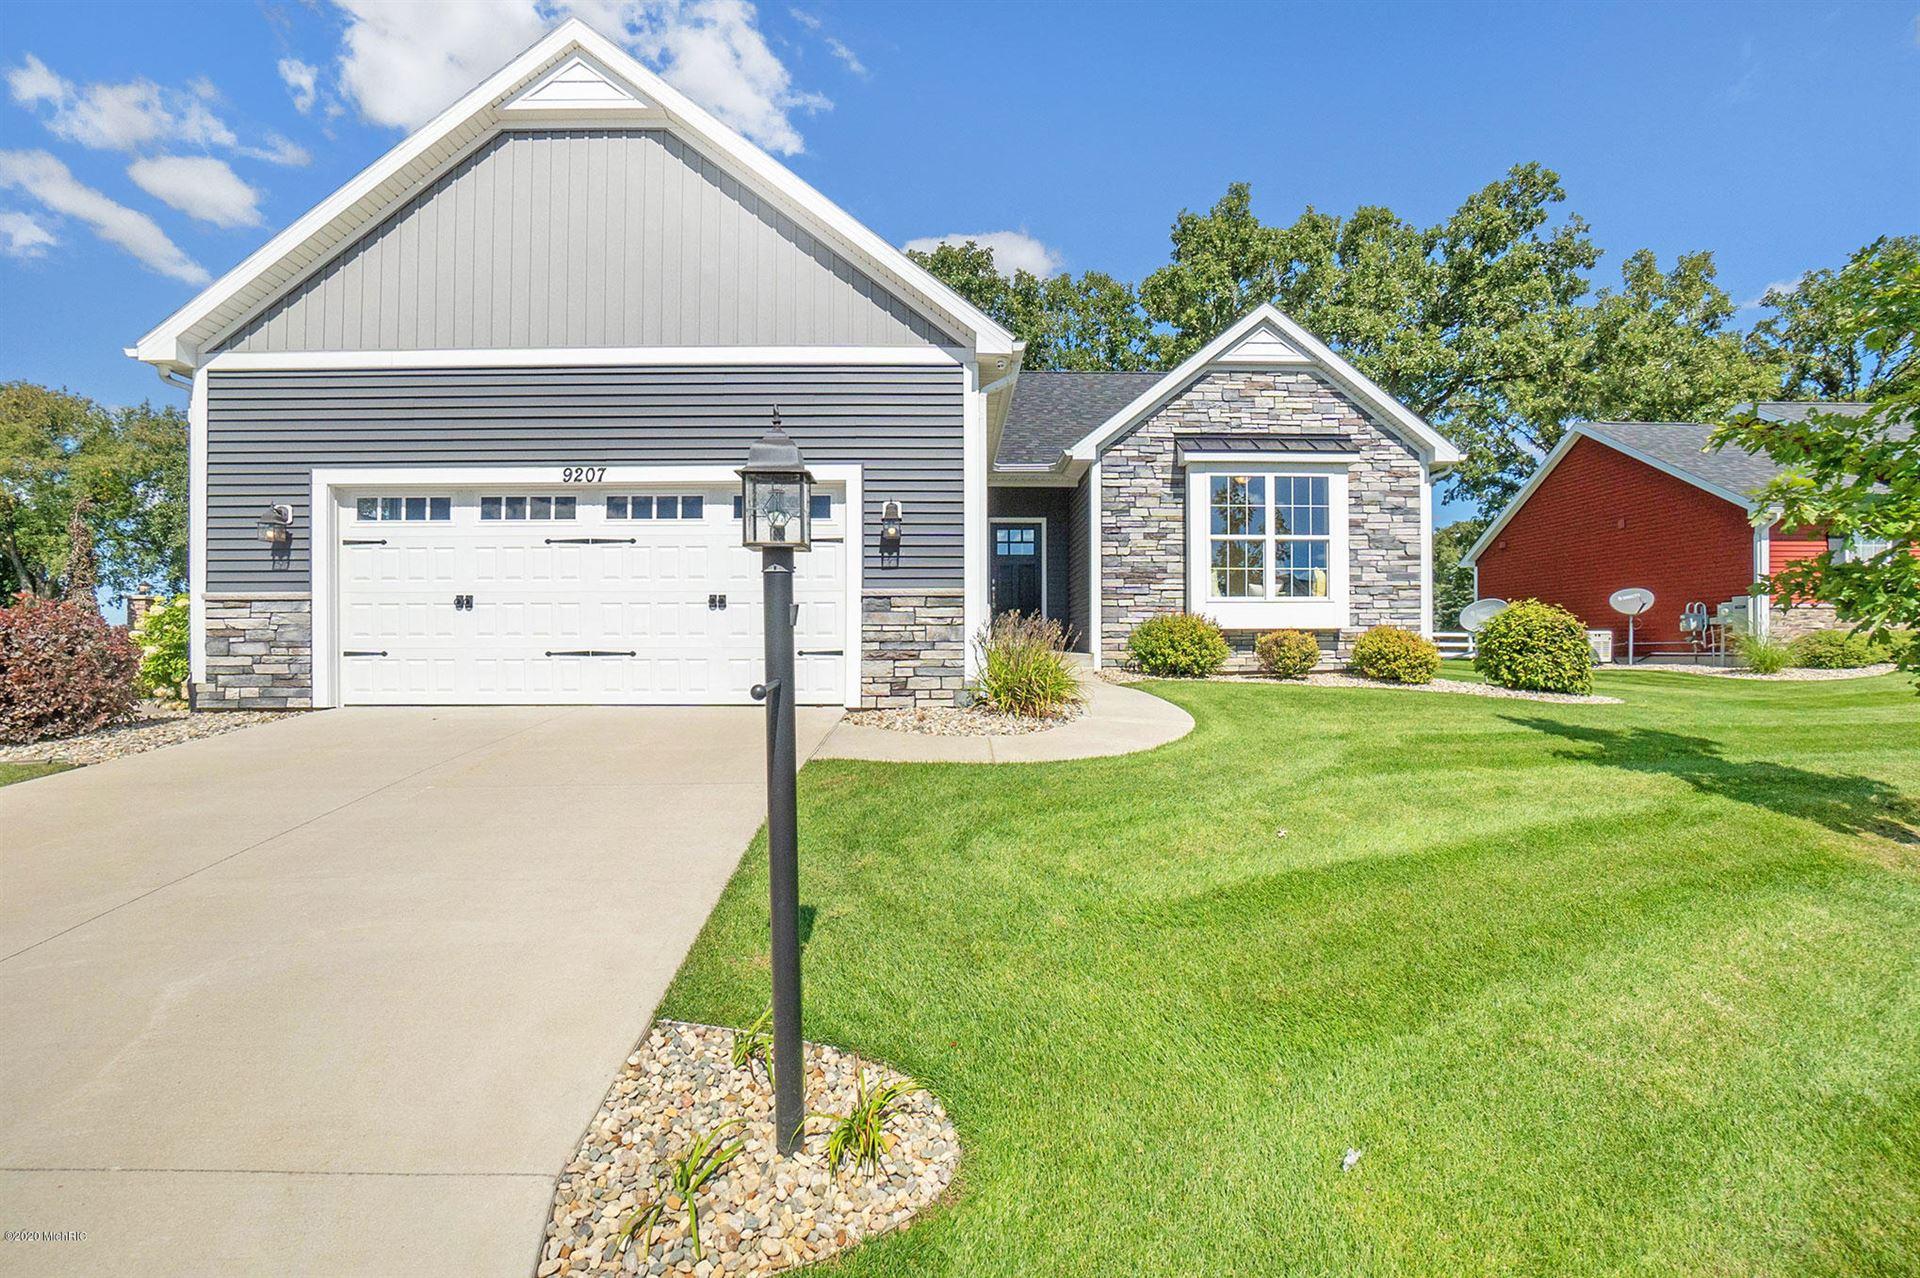 9207 Cottage Glen #1, Richland, MI 49083 - MLS#: 20039645